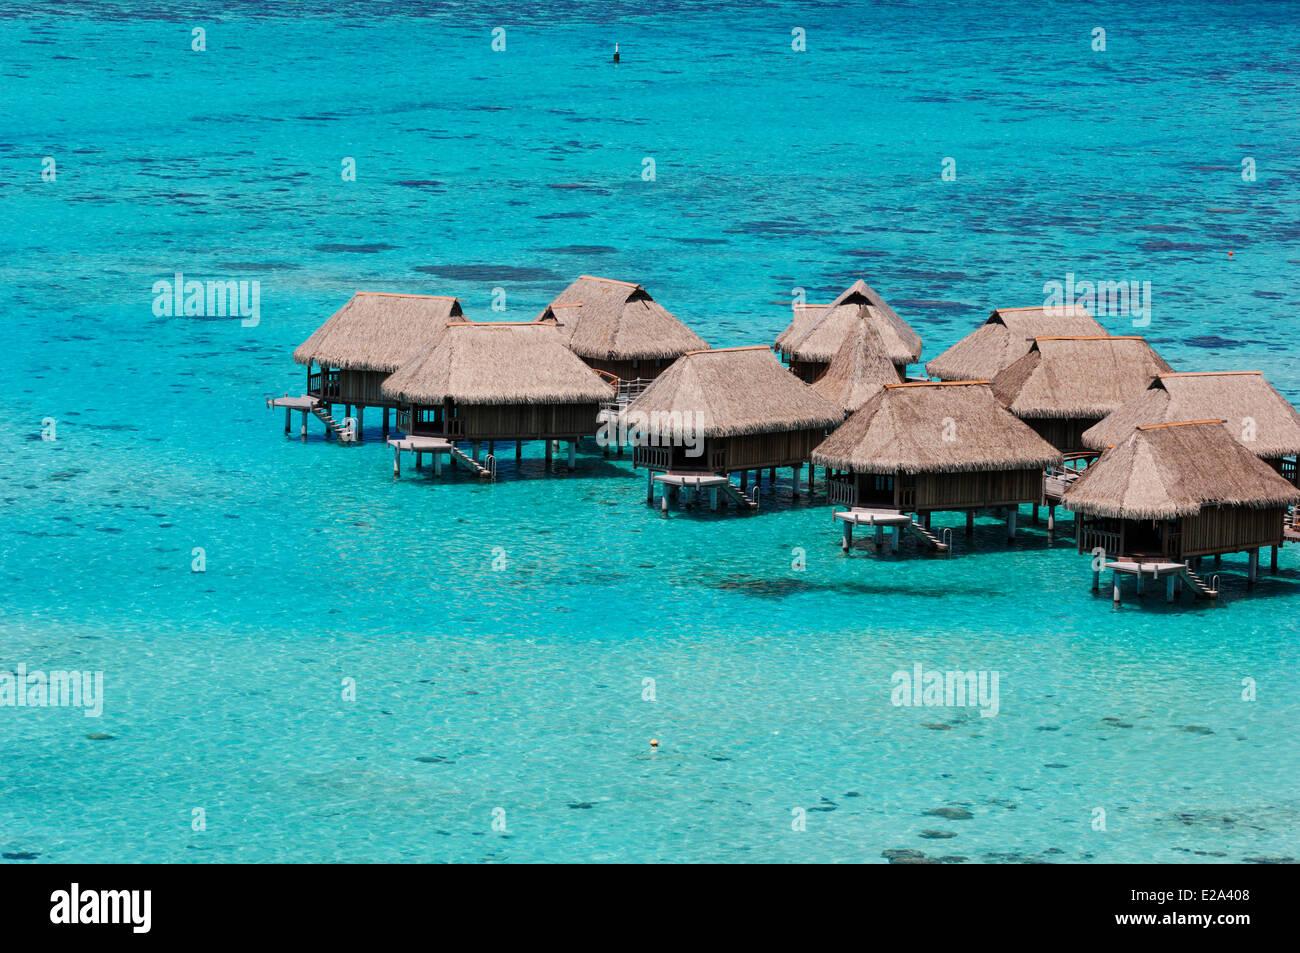 France French Polynesia Society Islands Windward Islands